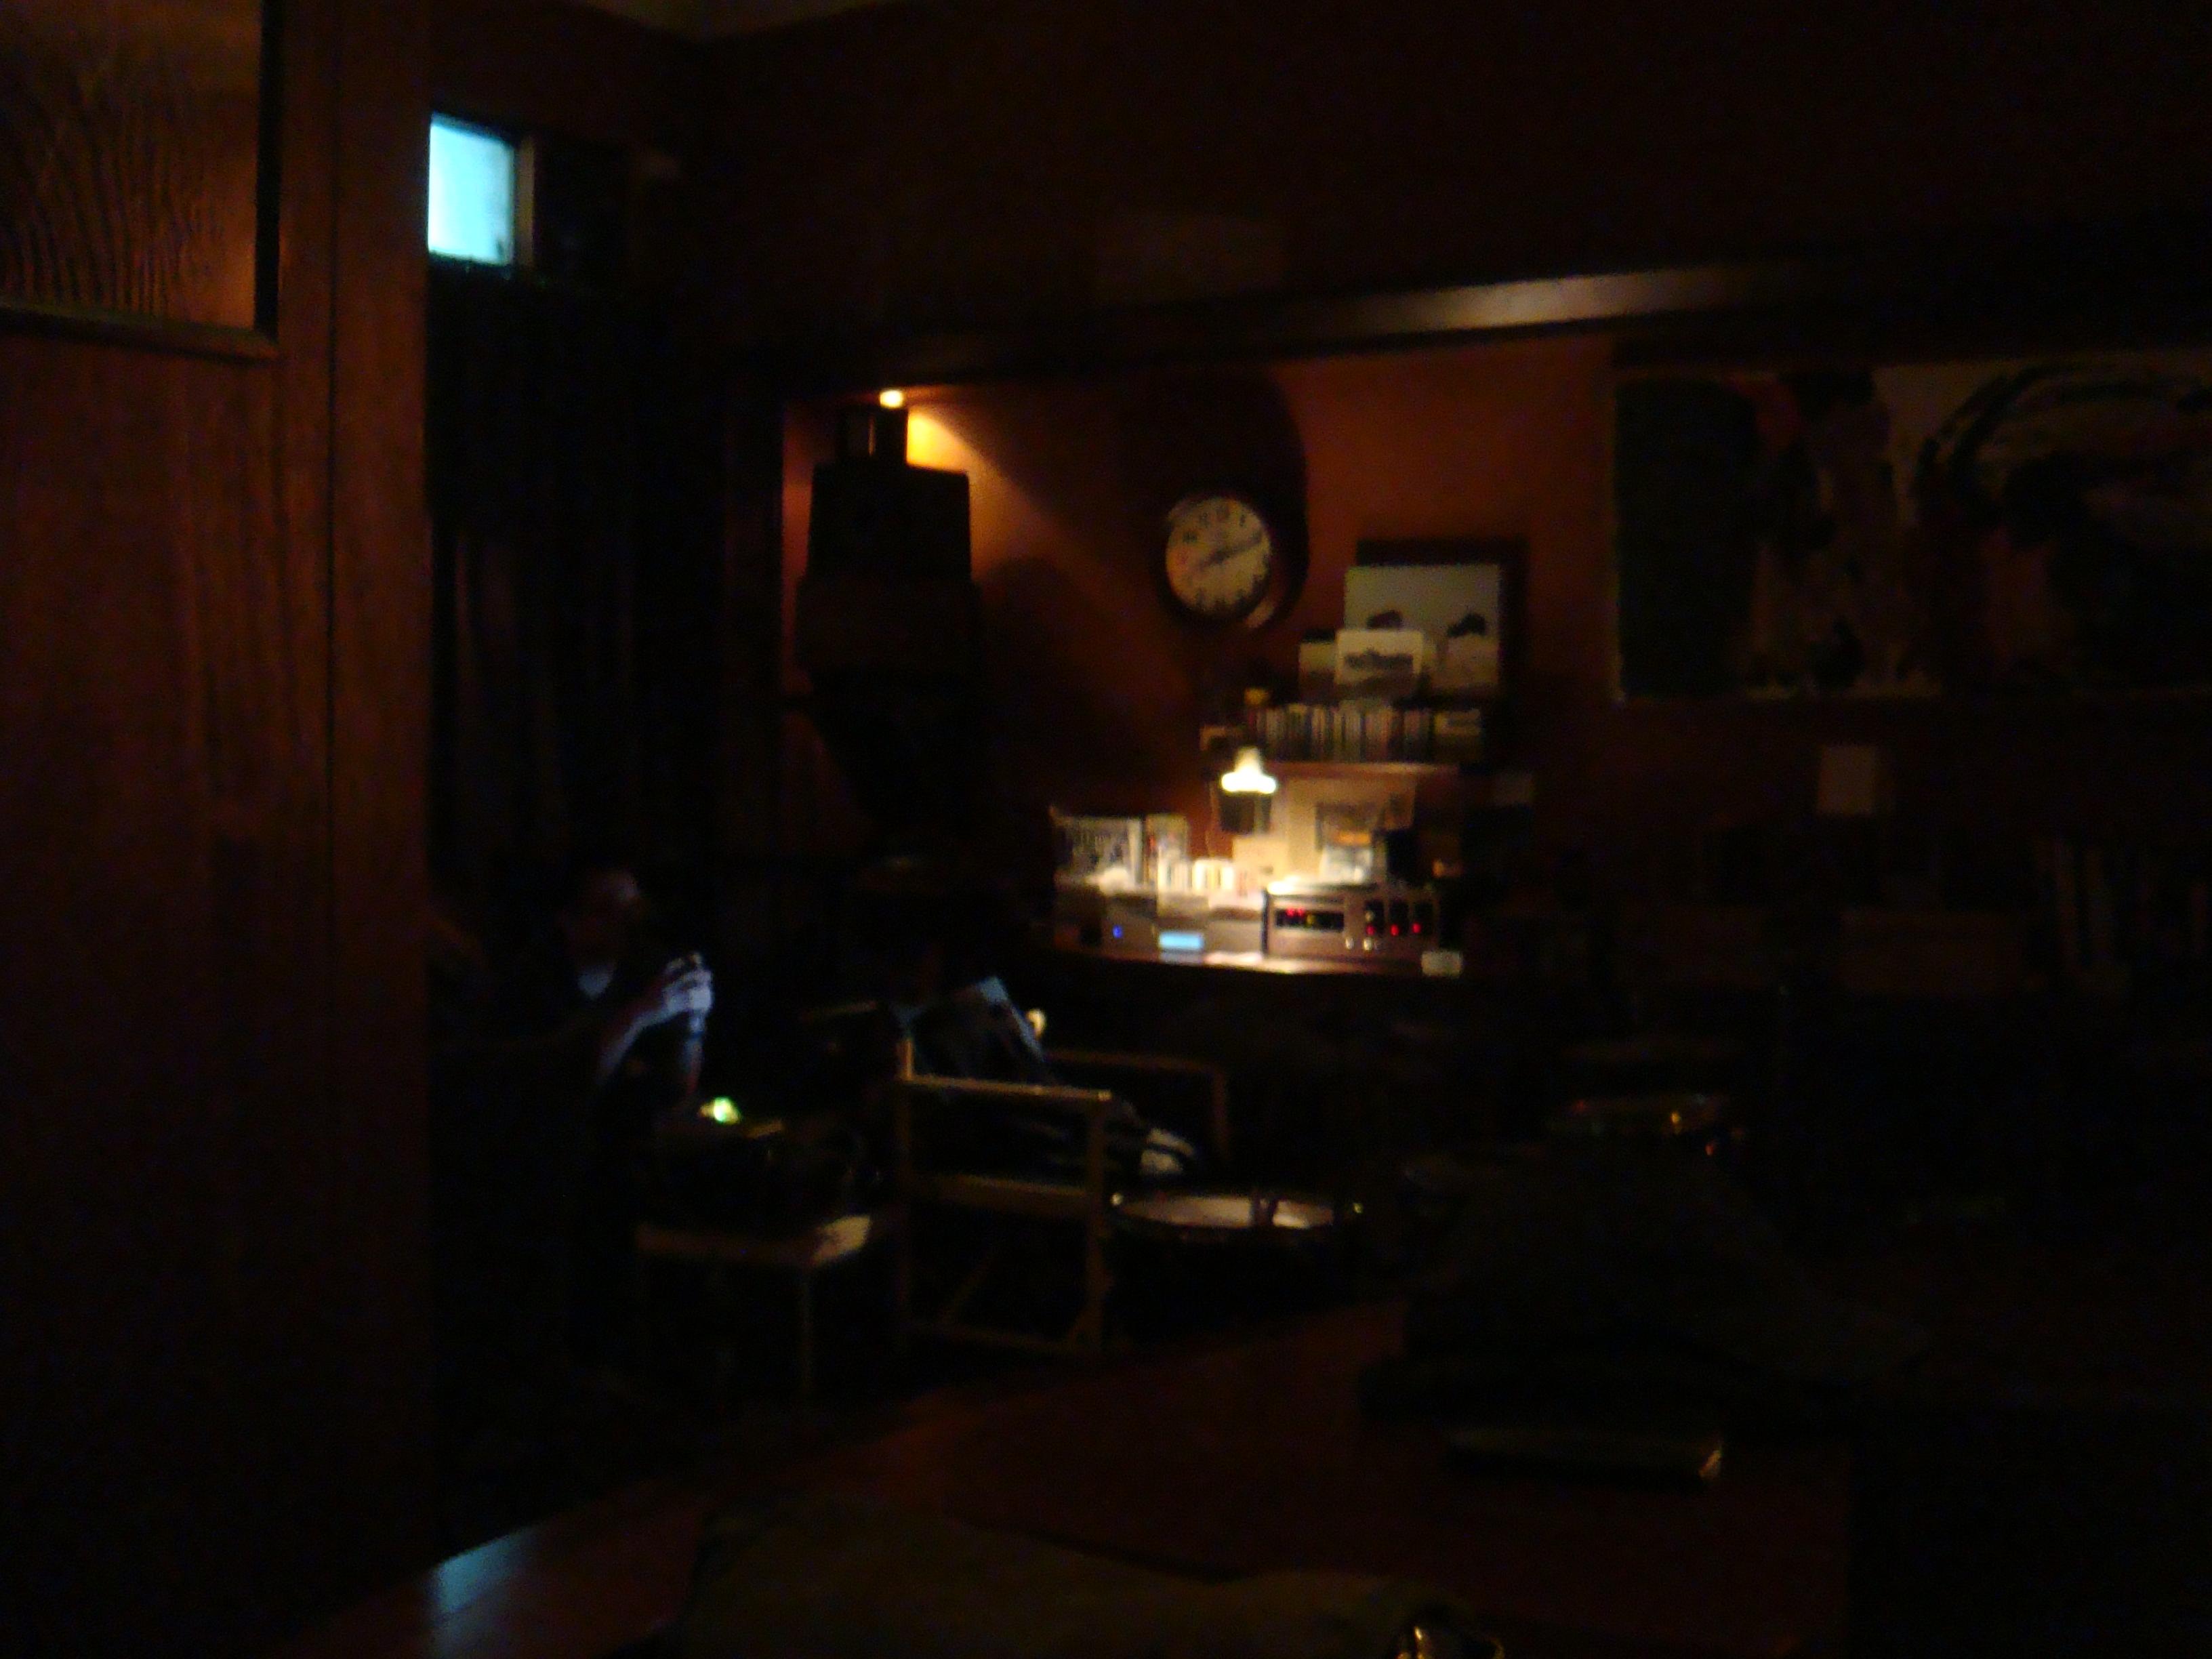 20110218-0219Marsalis Bar 馬沙里斯爵士酒館 應該是收音設備